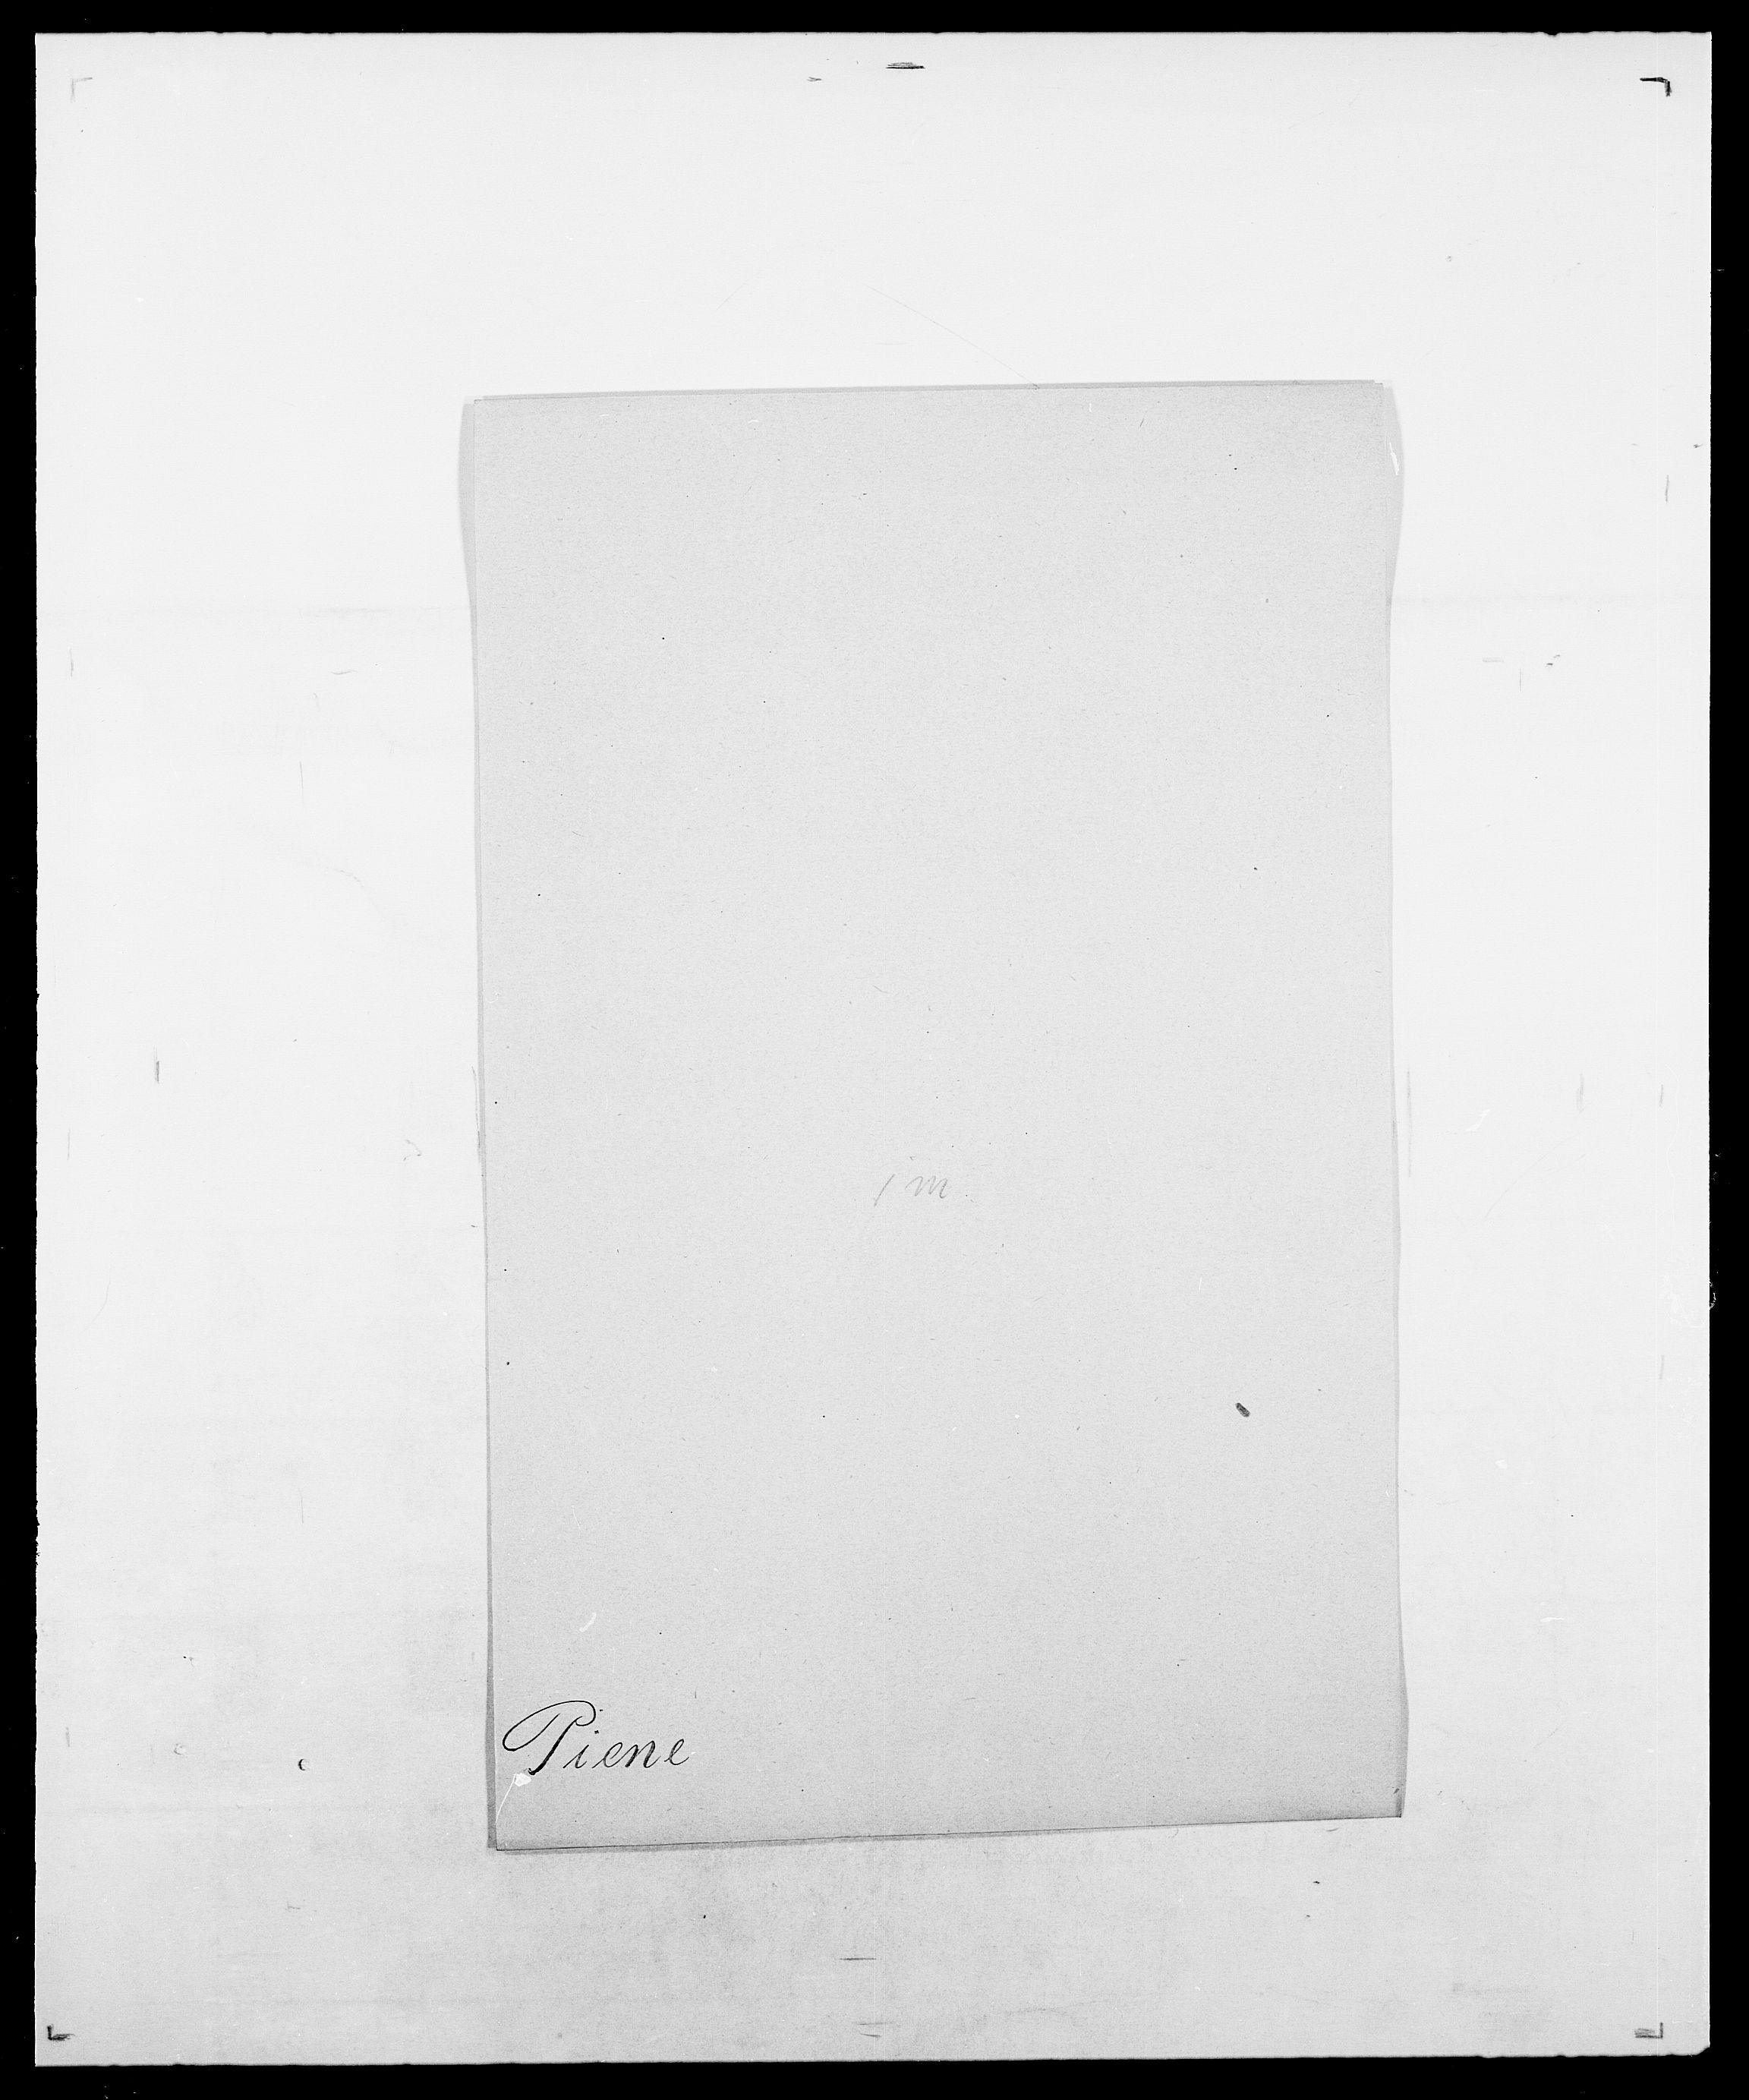 SAO, Delgobe, Charles Antoine - samling, D/Da/L0030: Paars - Pittelkov, s. 526